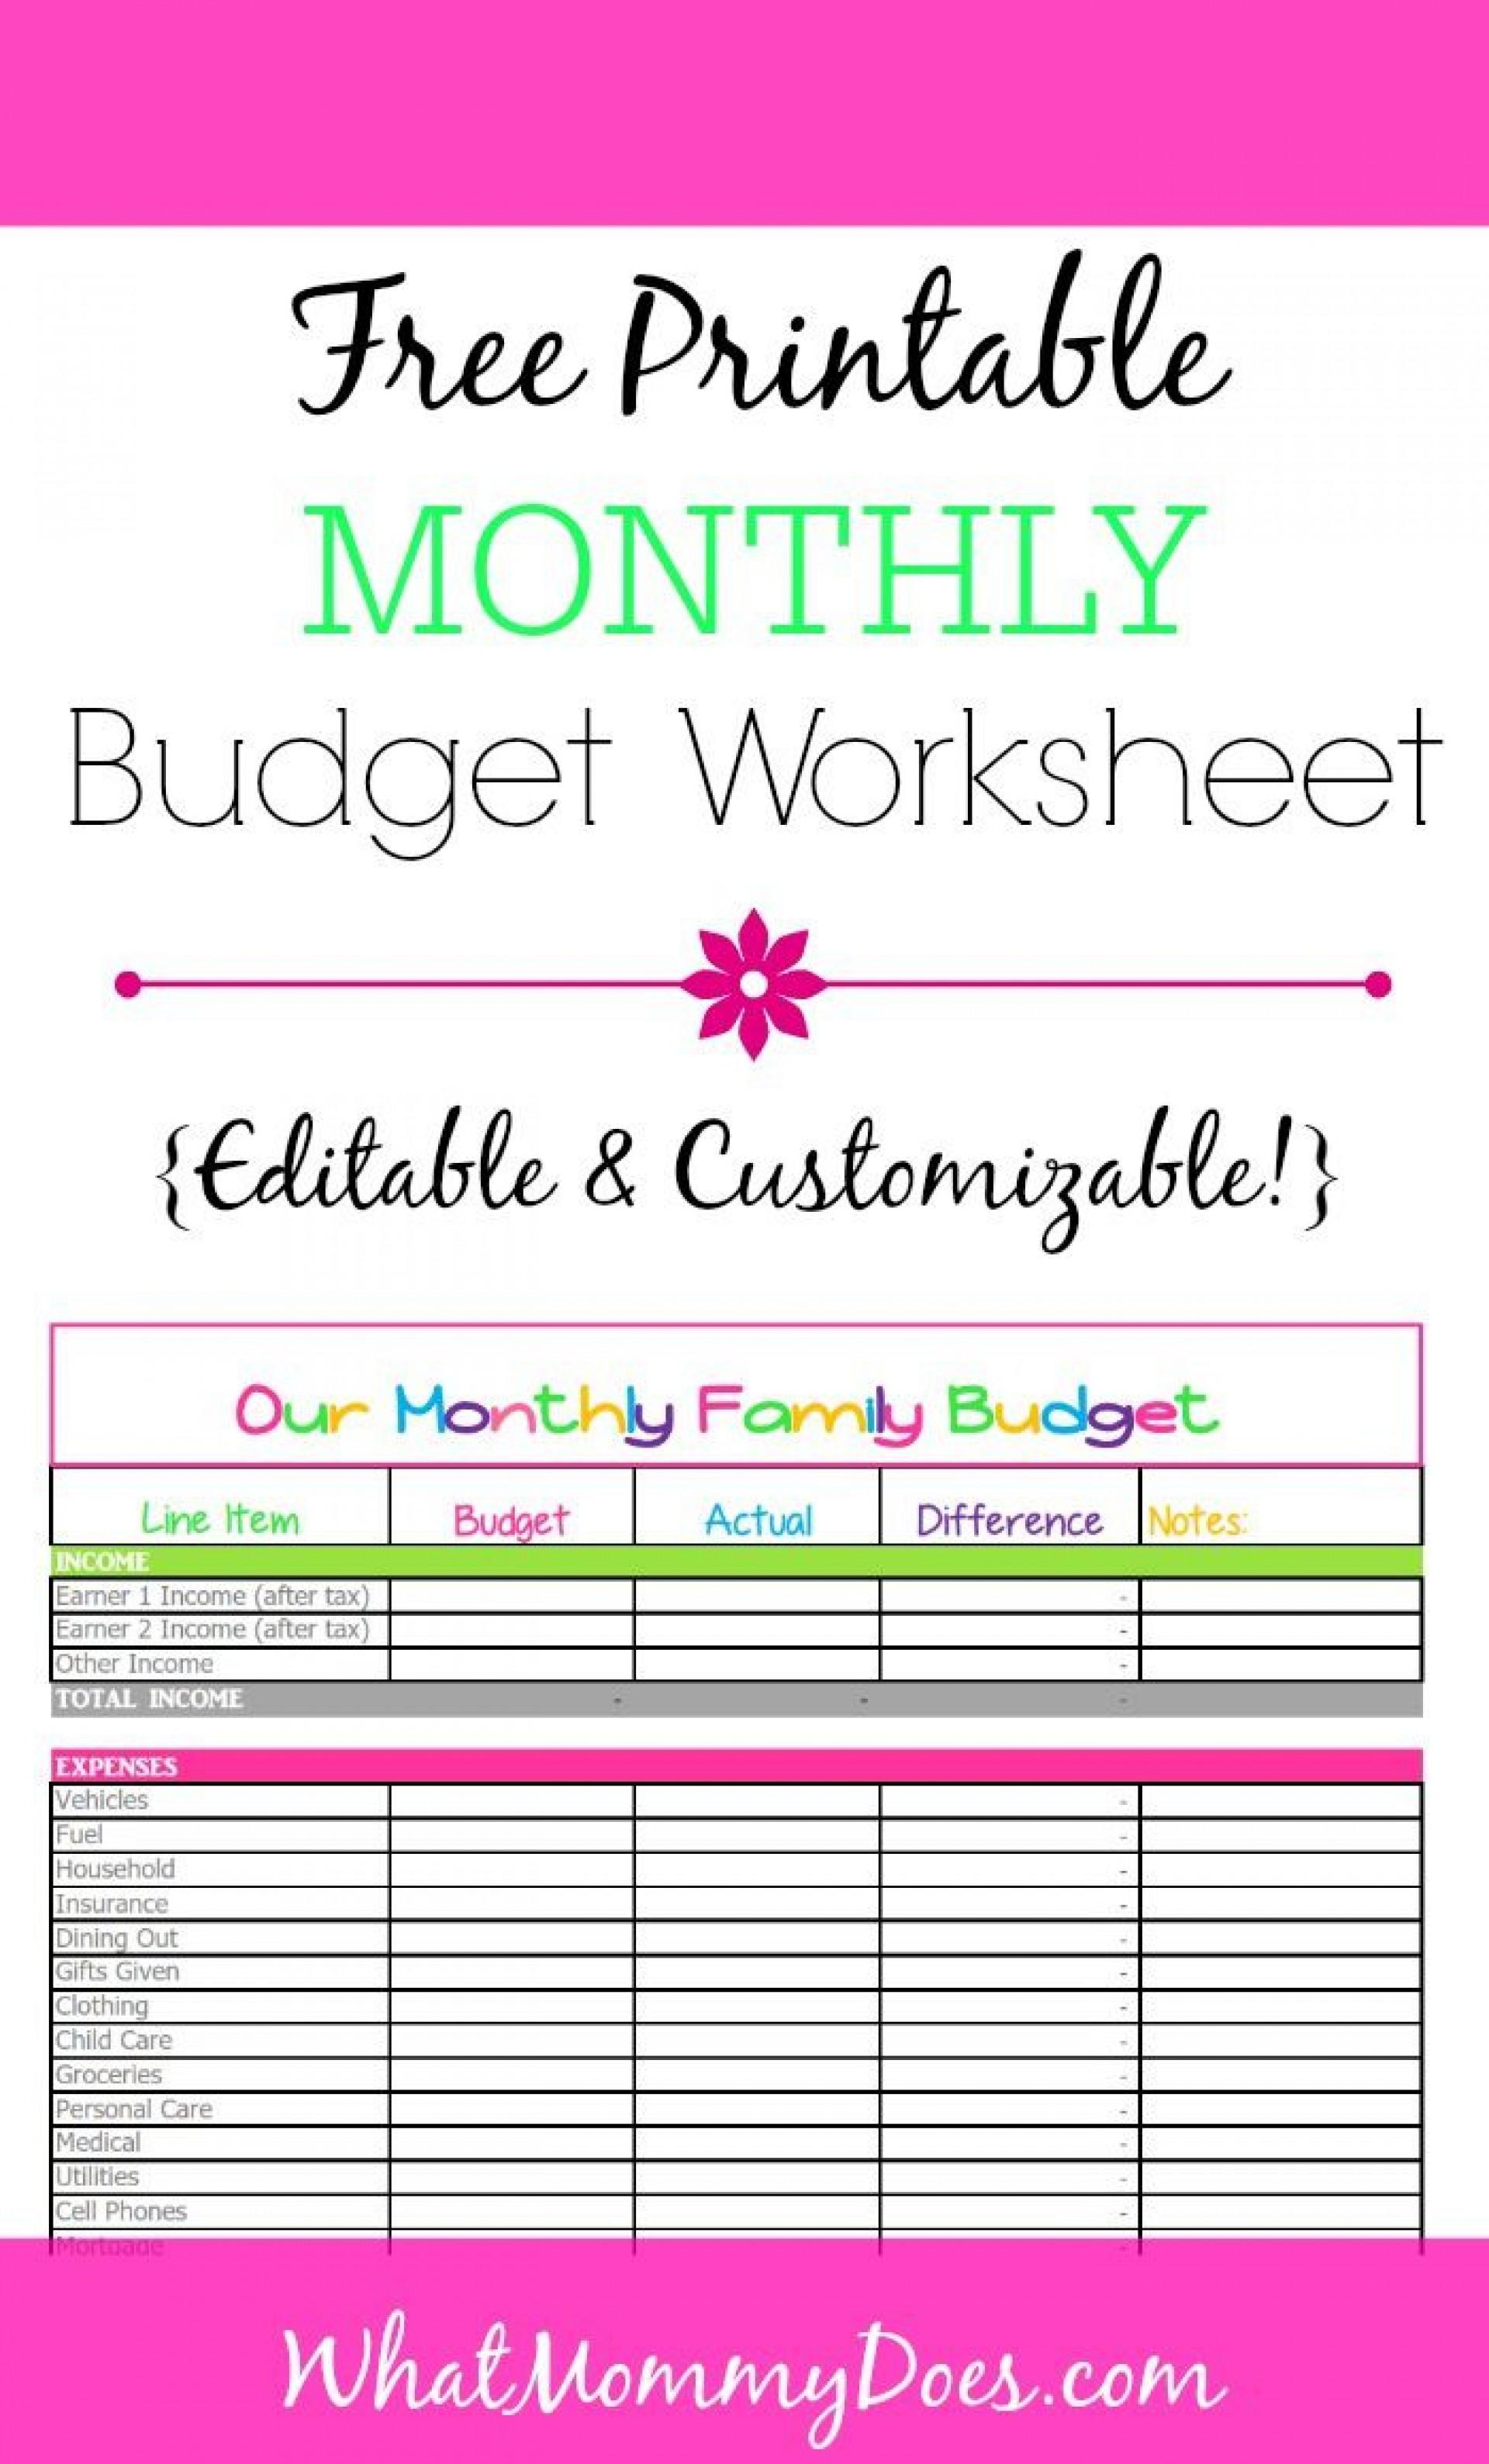 008 Fascinating Free Monthly Budget Template Printable Design  Simple Worksheet Household Planner Uk1920